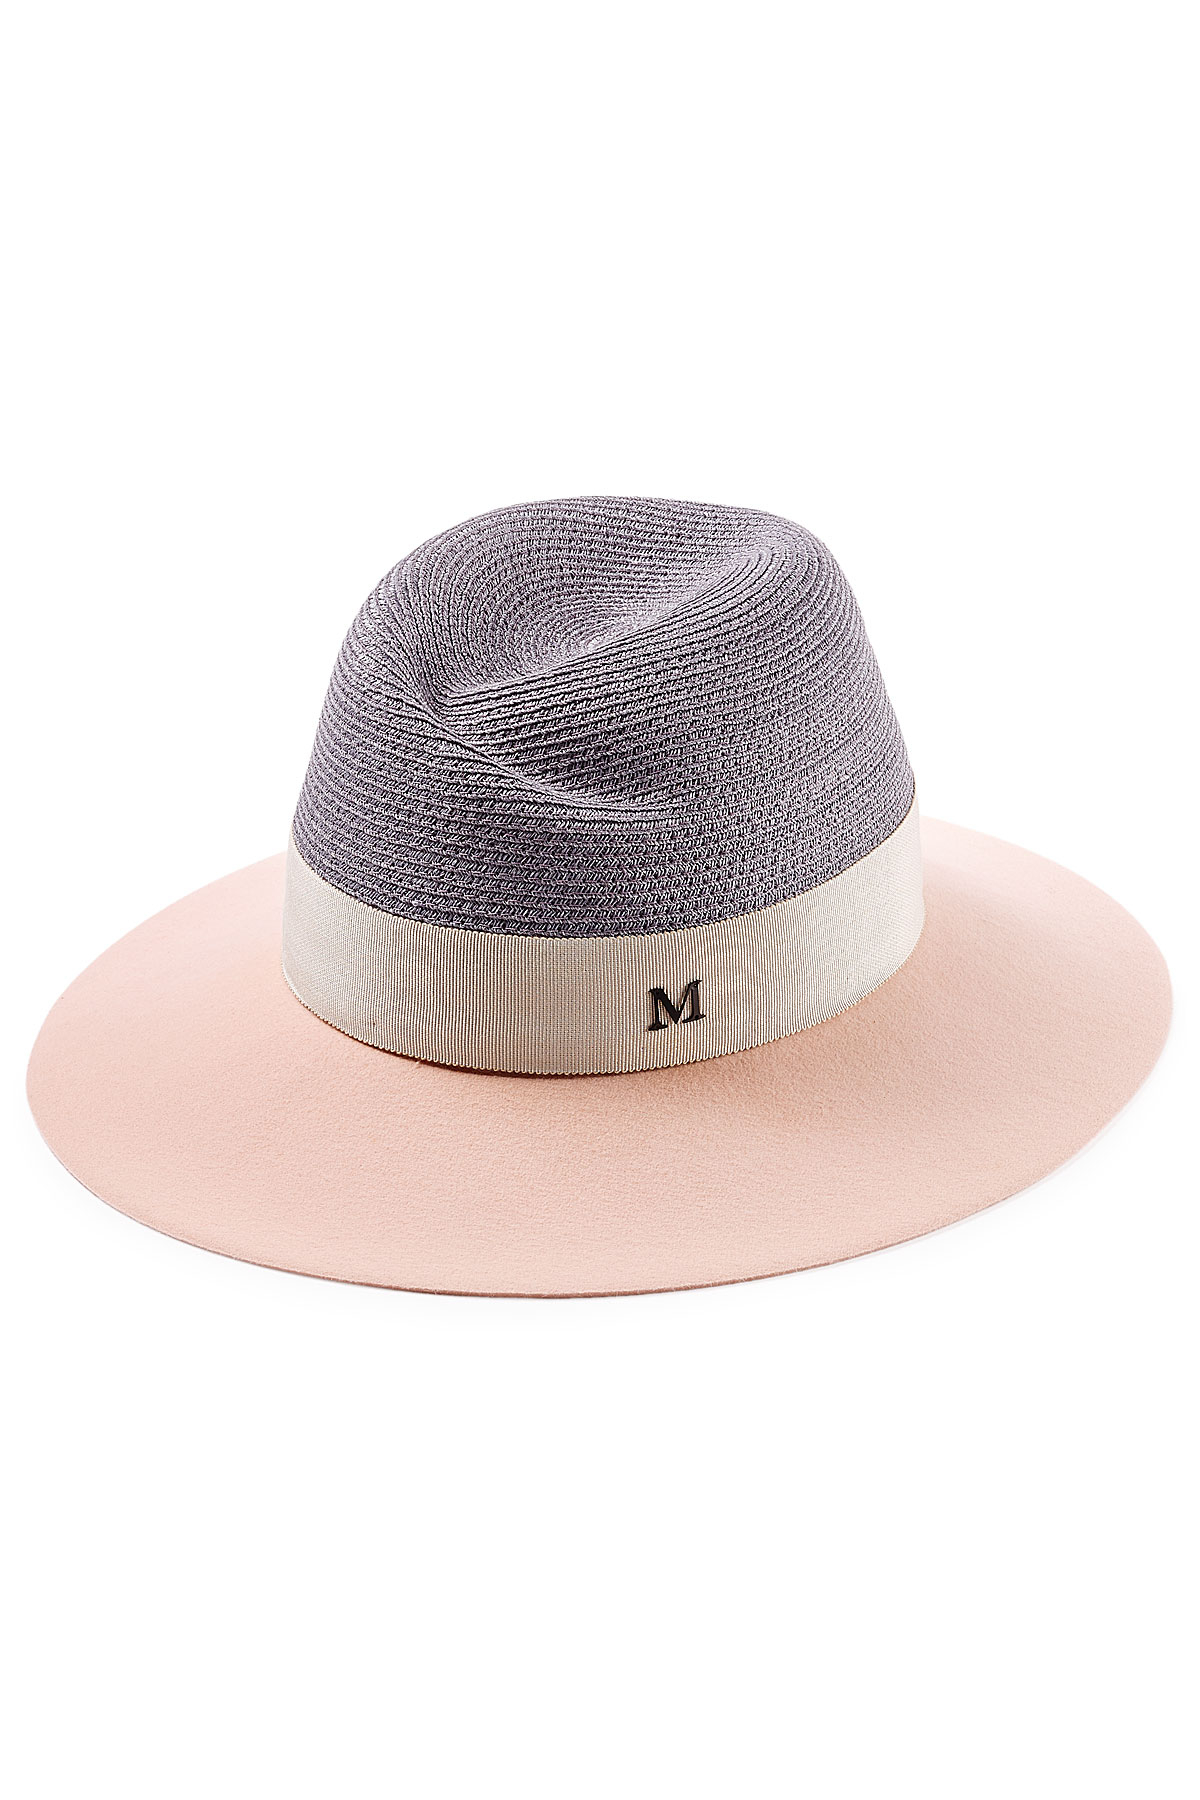 Maison michel virginie felt and straw hat in pink lyst for Maison michel